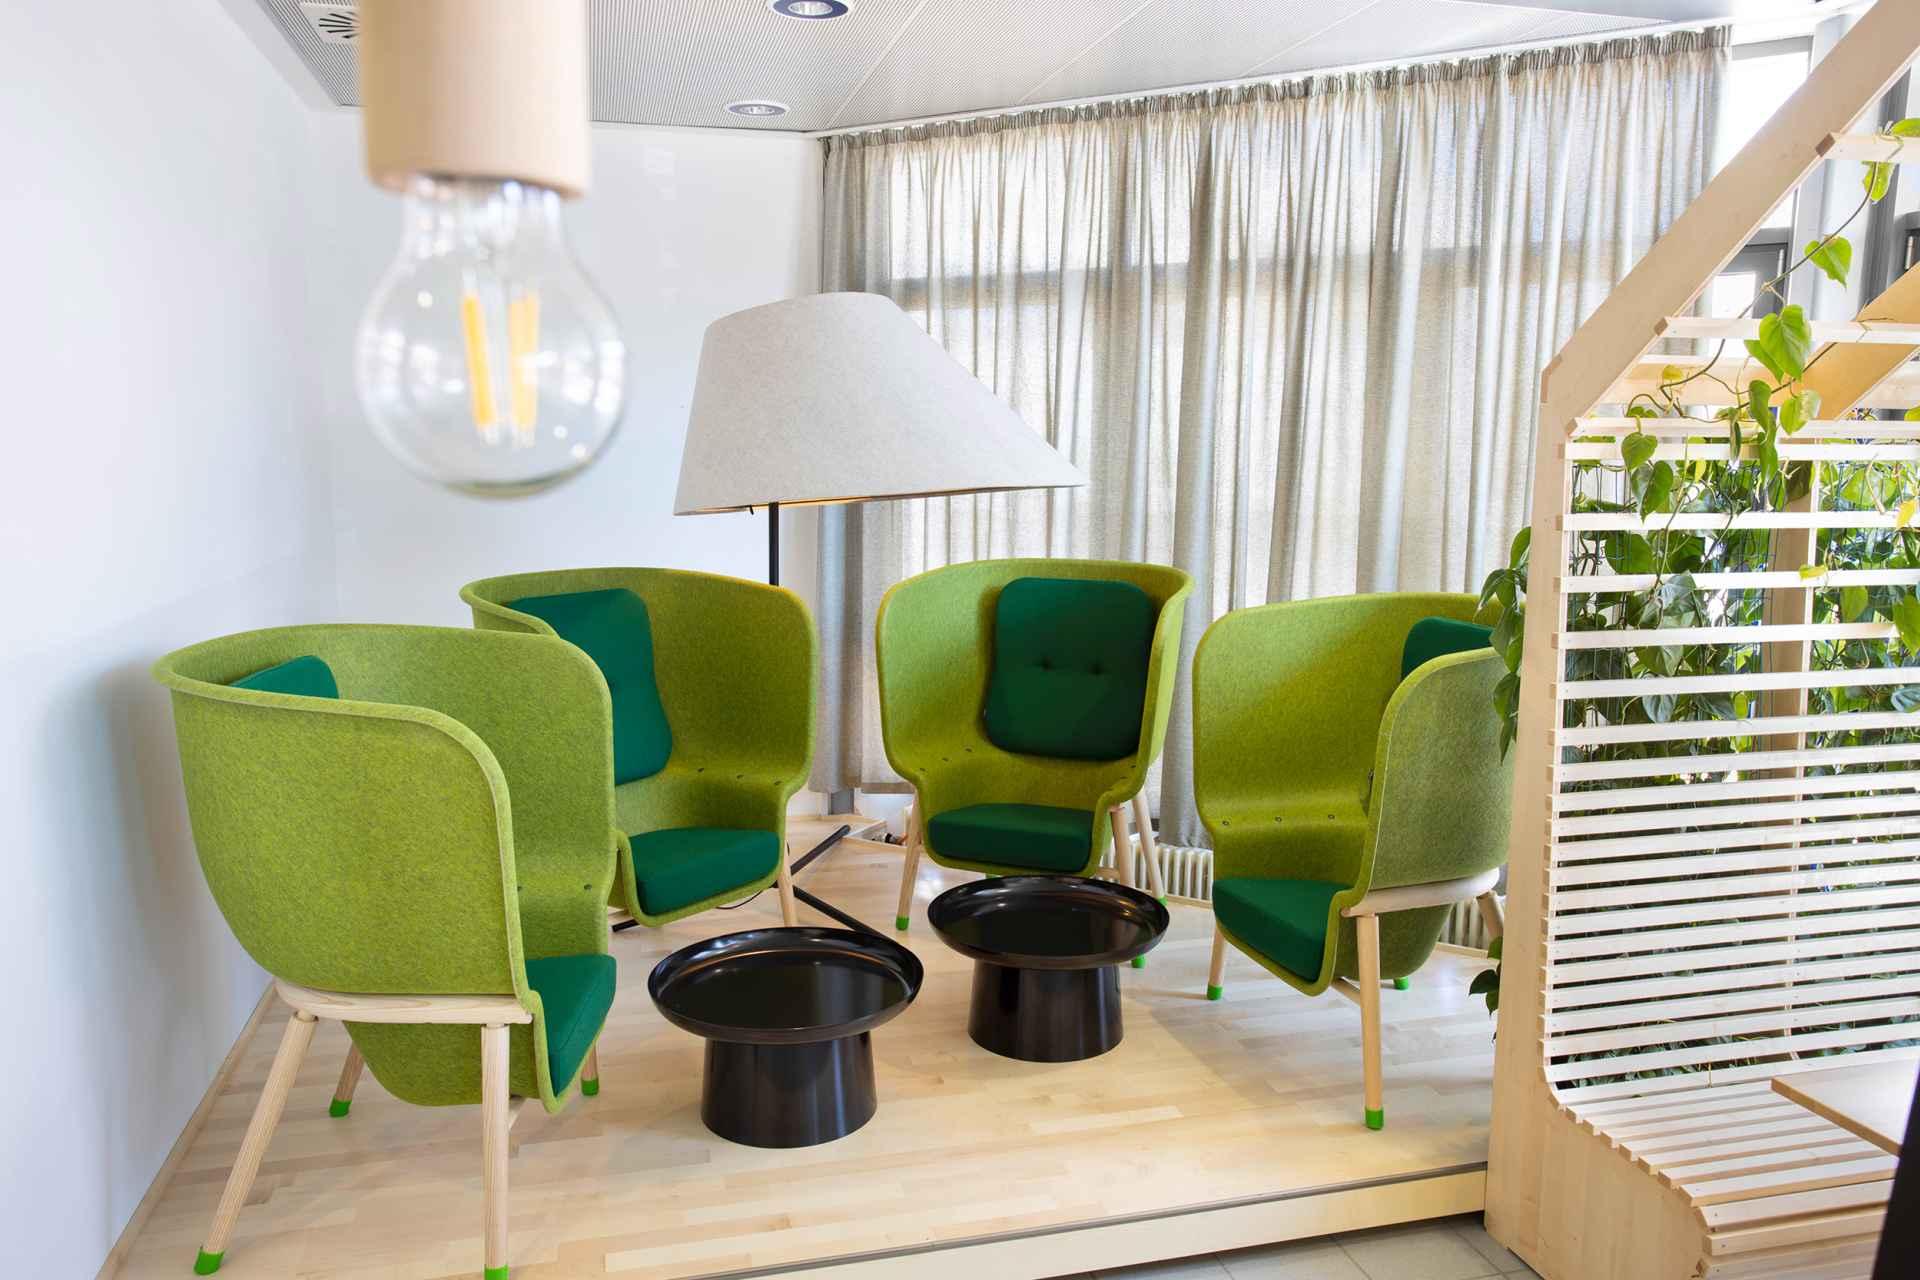 Die Sessel bestehen aus 100 Prozent recyceltem PET-Felt.